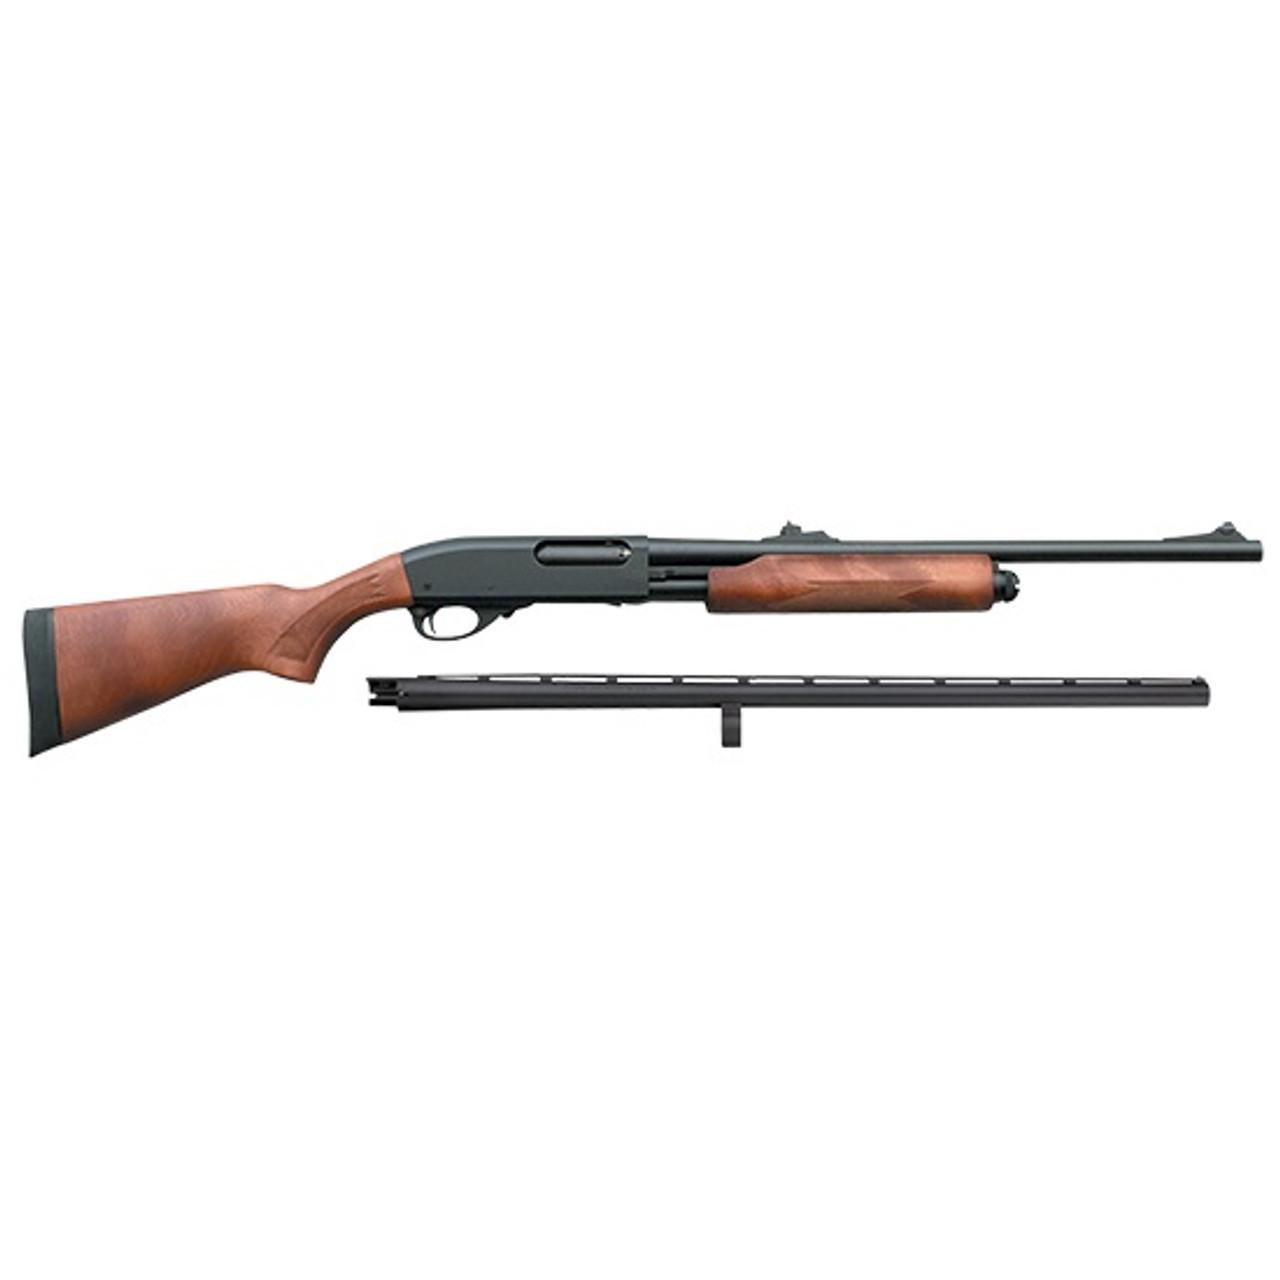 Remington 870 Field & Home Combo CALIFORNIA LEGAL - 12ga - Wood